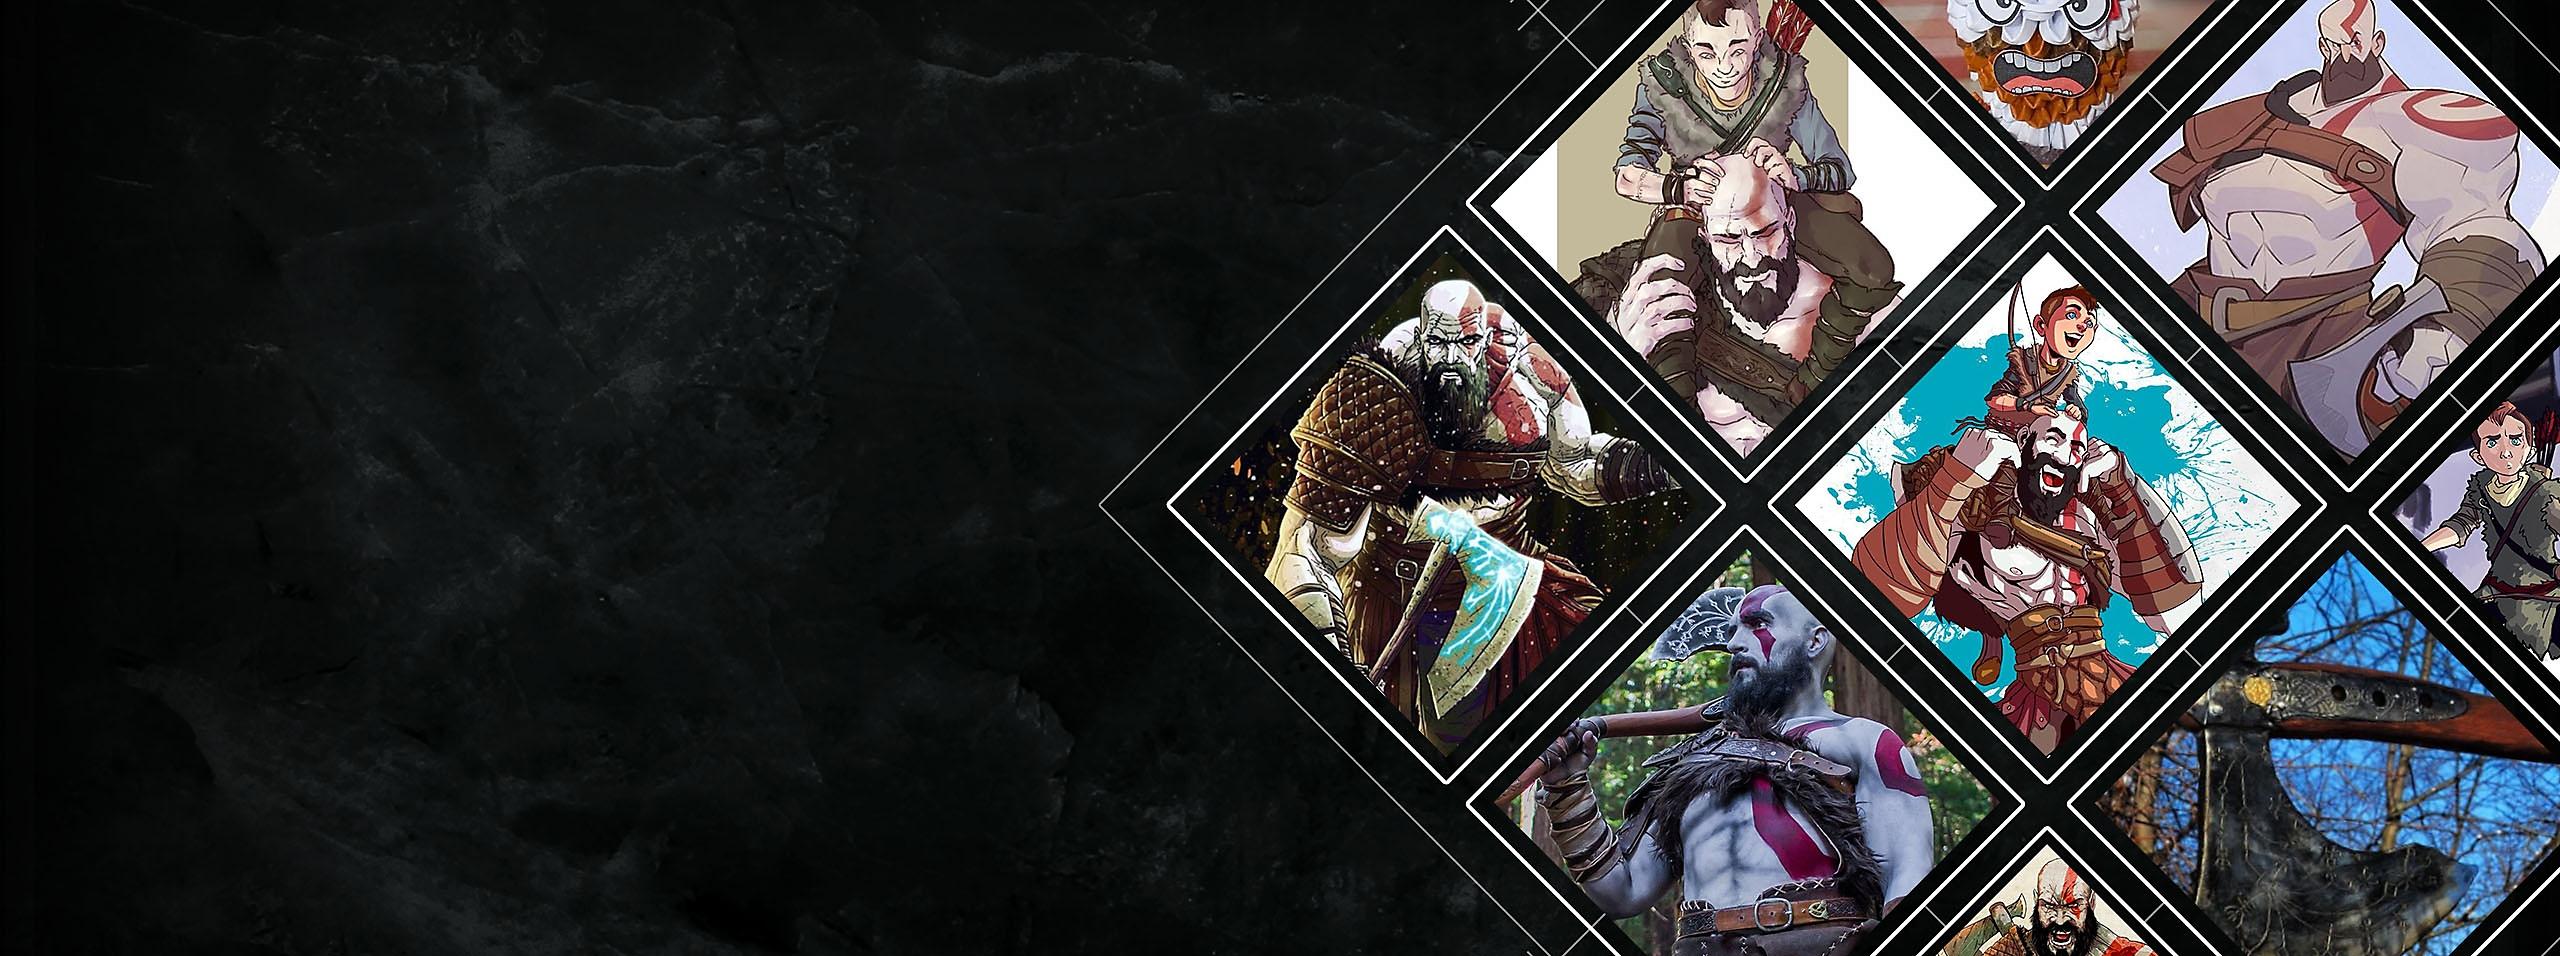 God of War Fanart